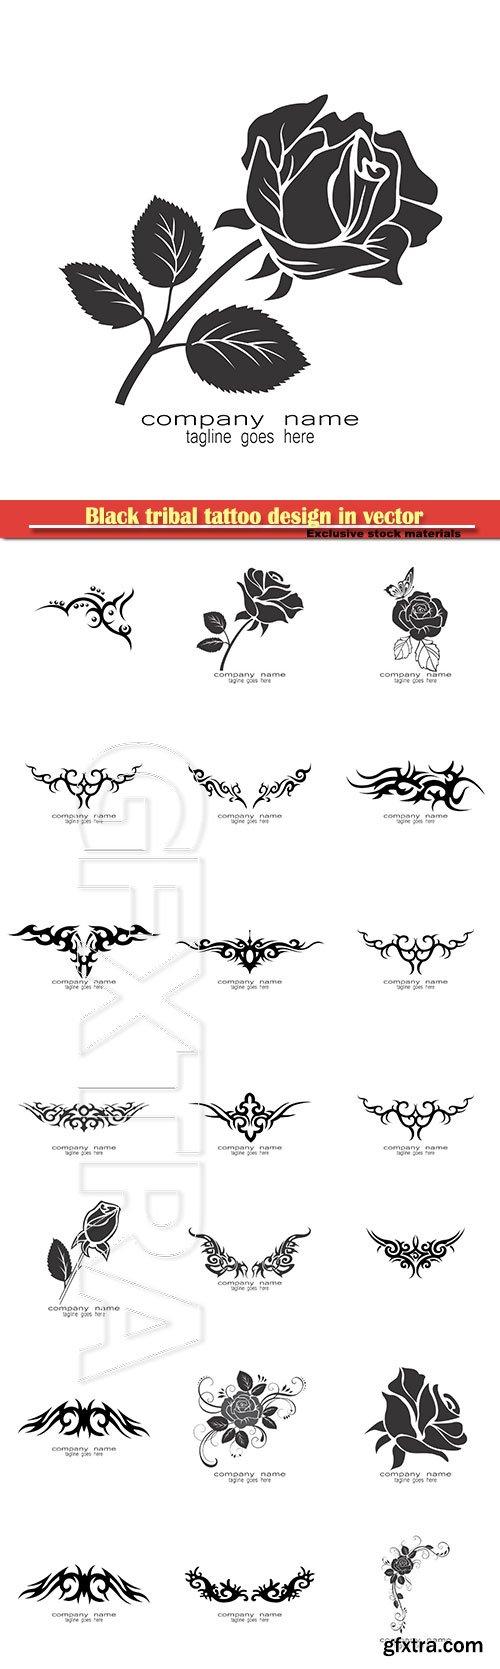 Black tribal tattoo design in vector illustration